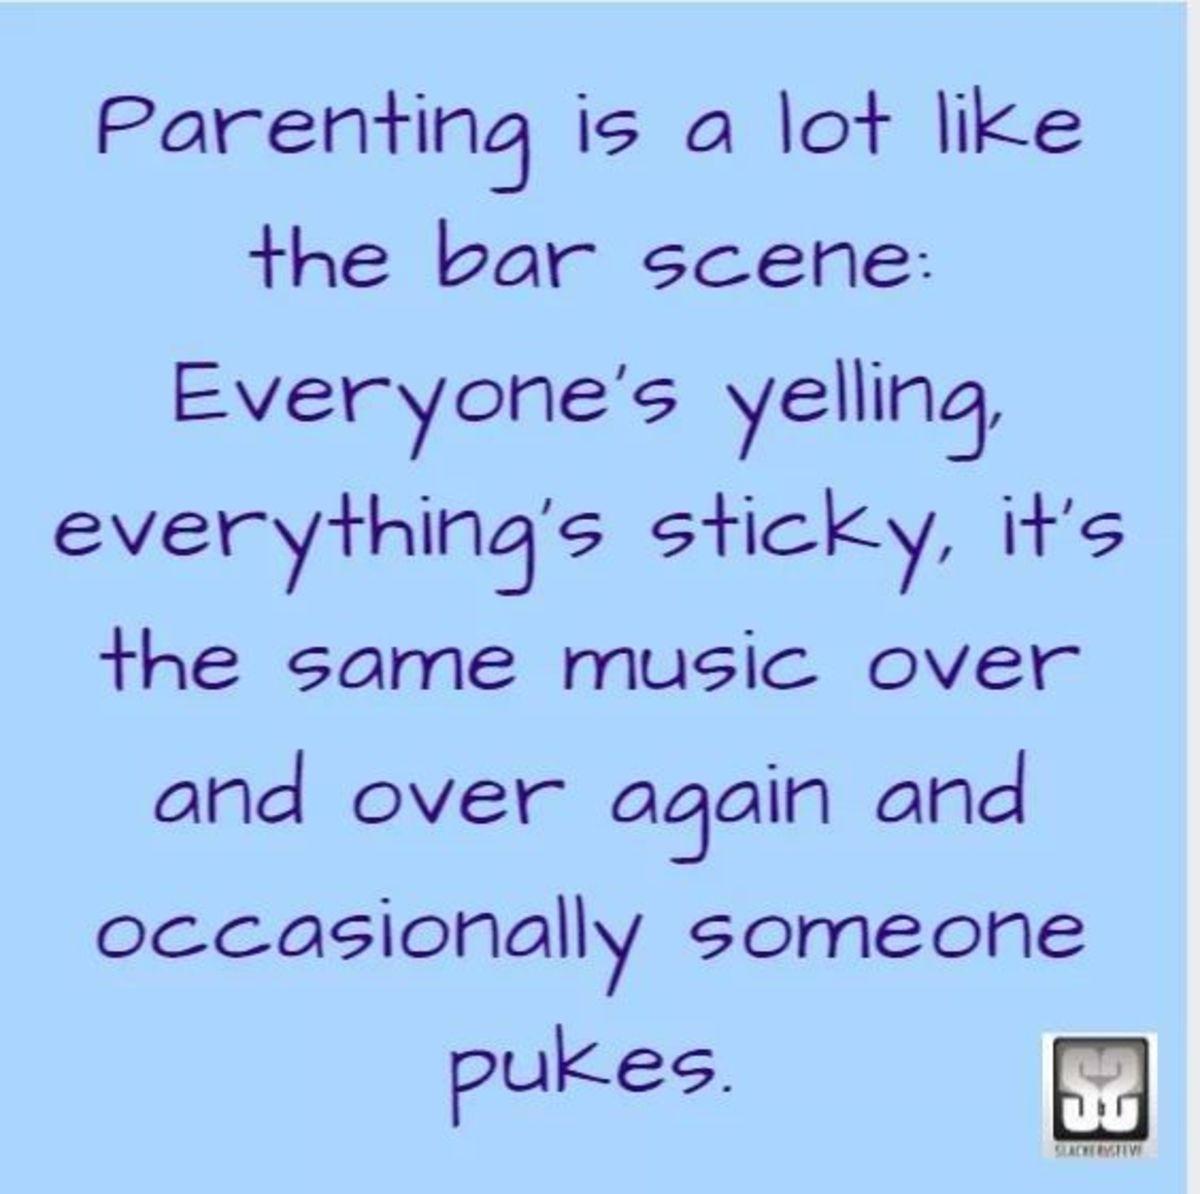 parenting-bar